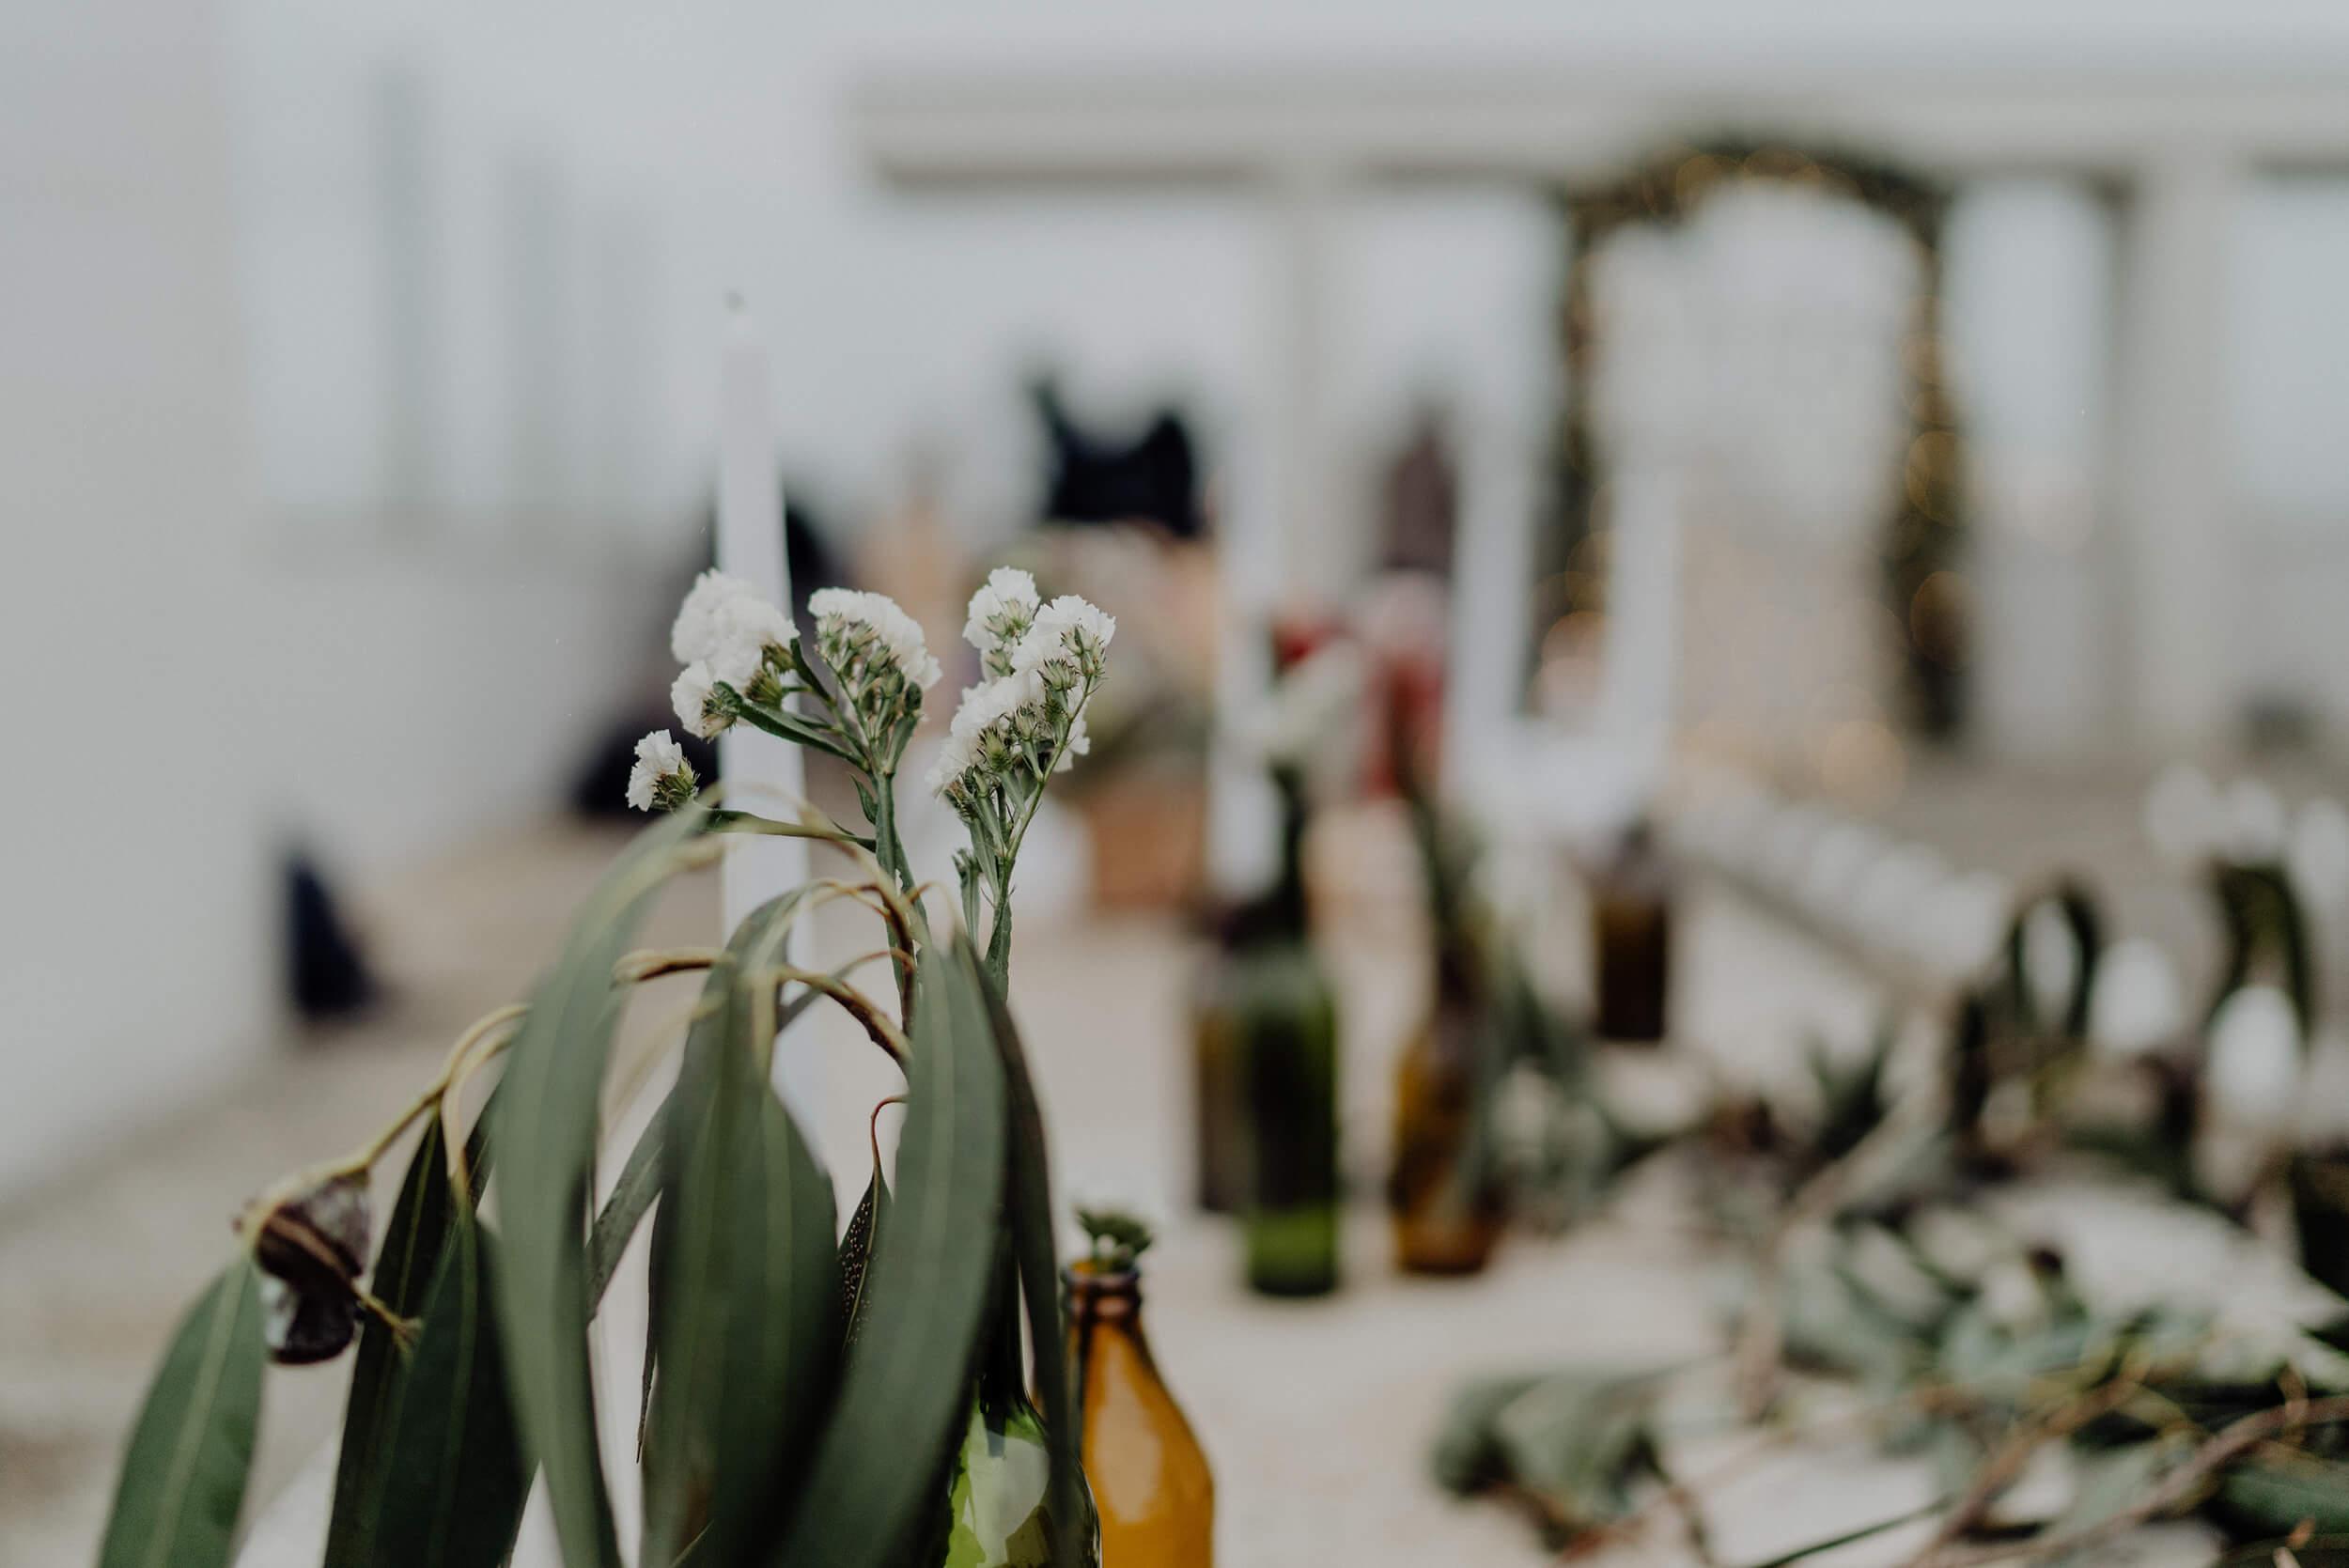 roma-organizacao-eventos-pedido-de-casamento-no-porto-5